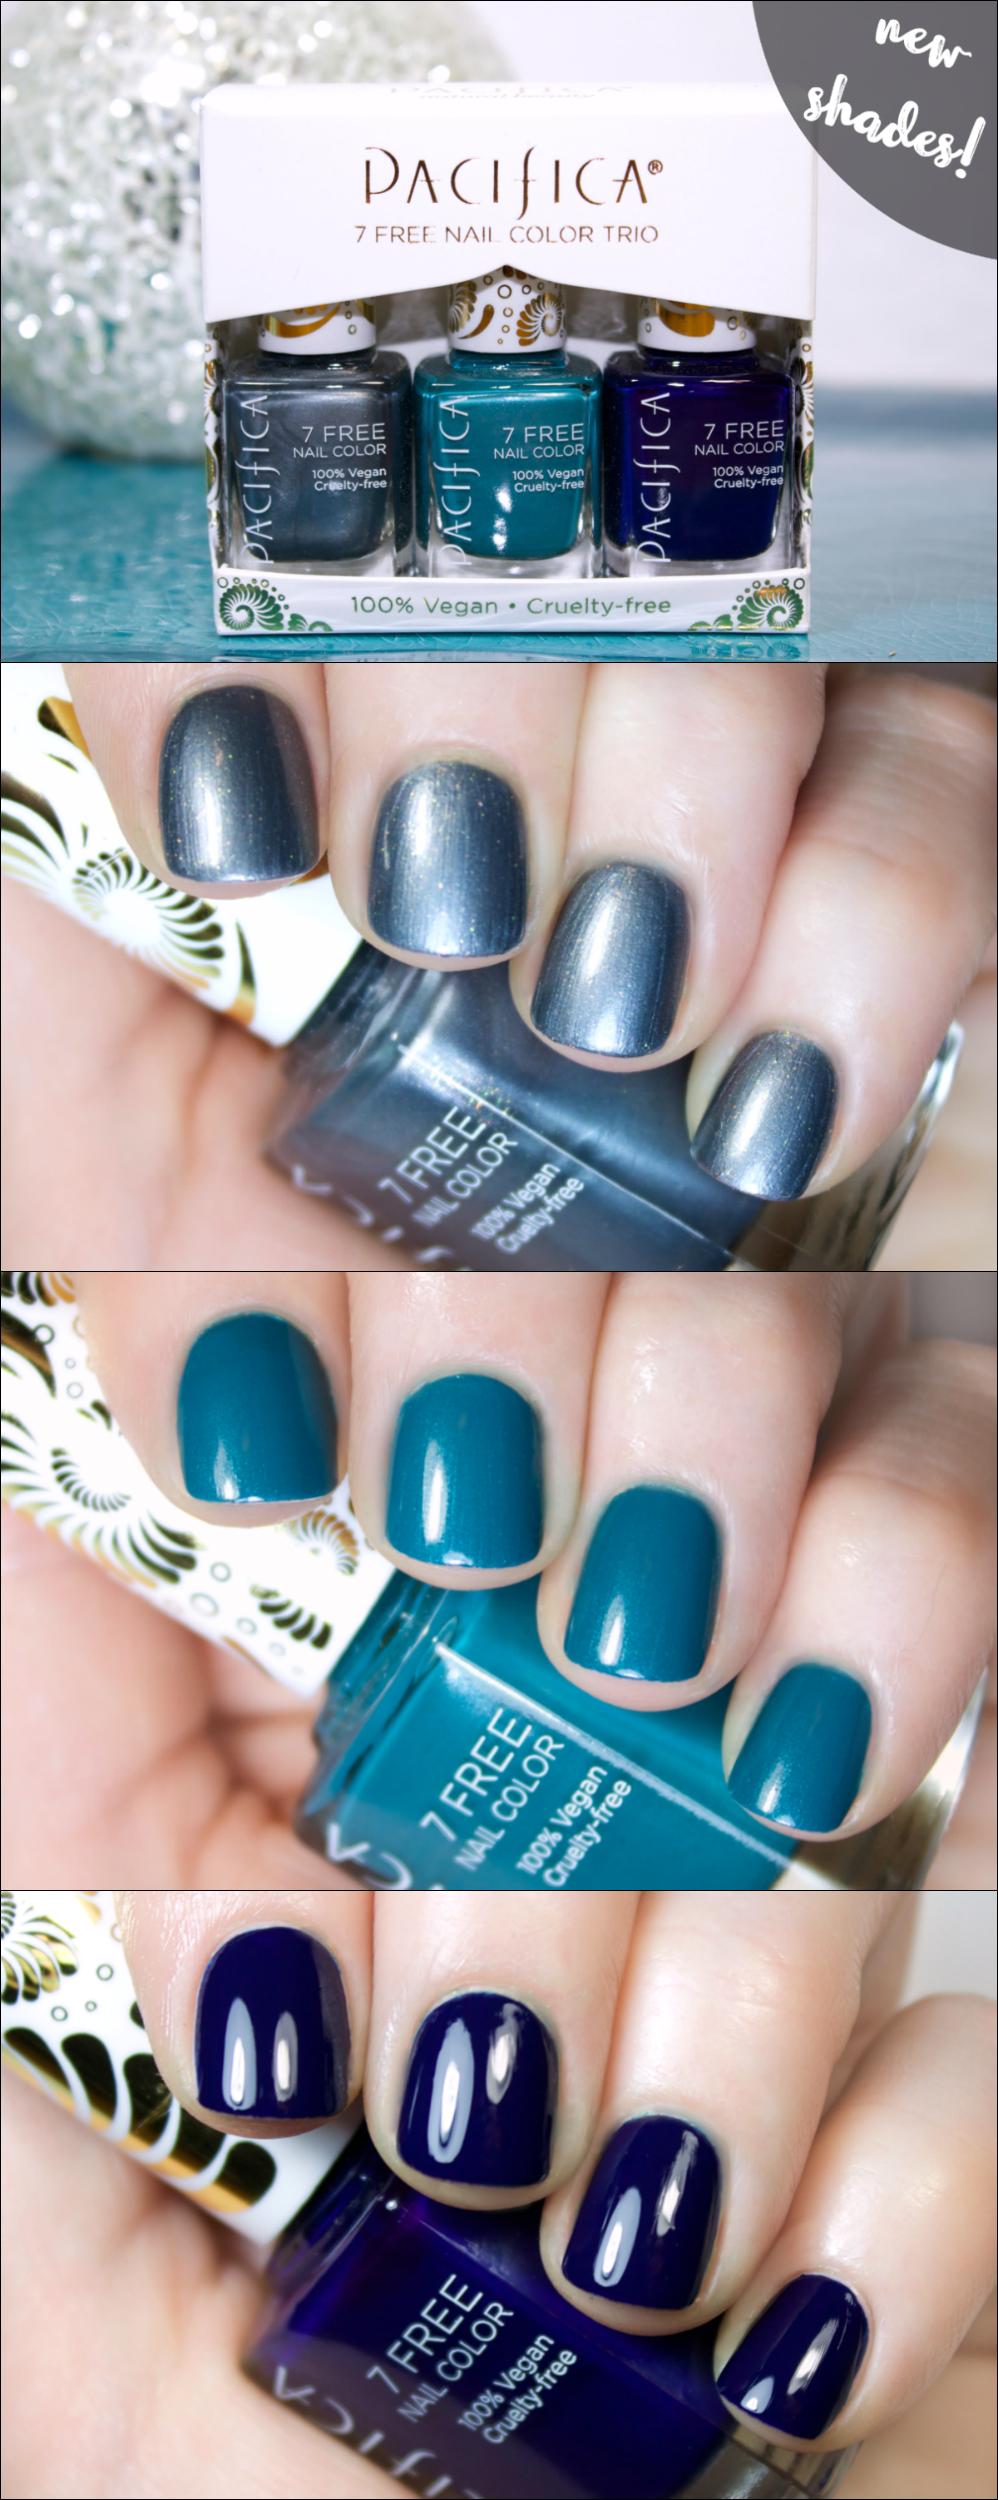 NEW PACIFICA BEAUTY NAIL POLISH SHADES | Pinterest | Beauty nails ...